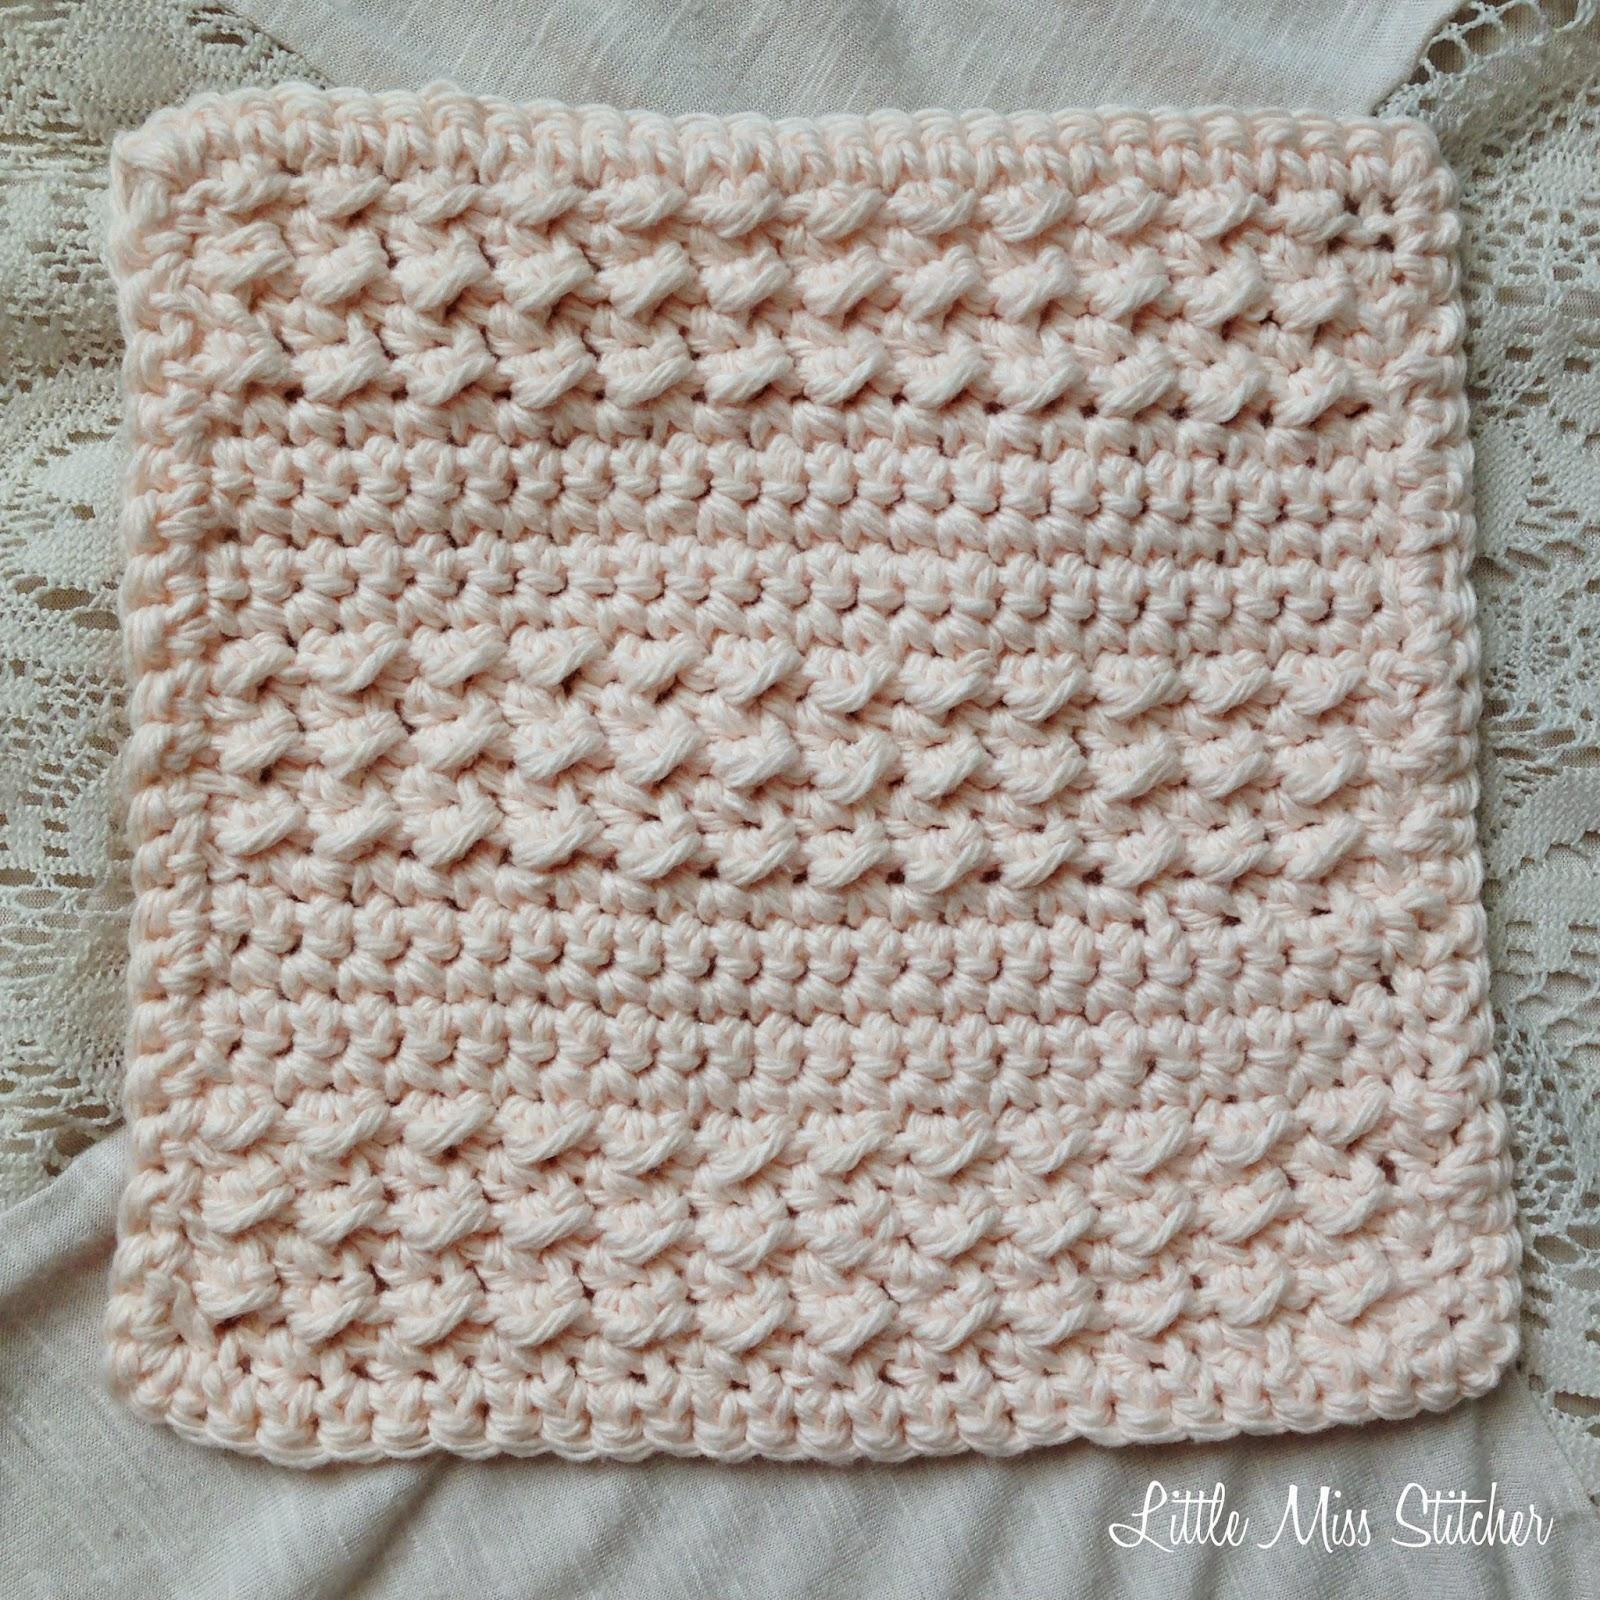 Little Miss Stitcher 5 Free Crochet Dishcloth Patterns